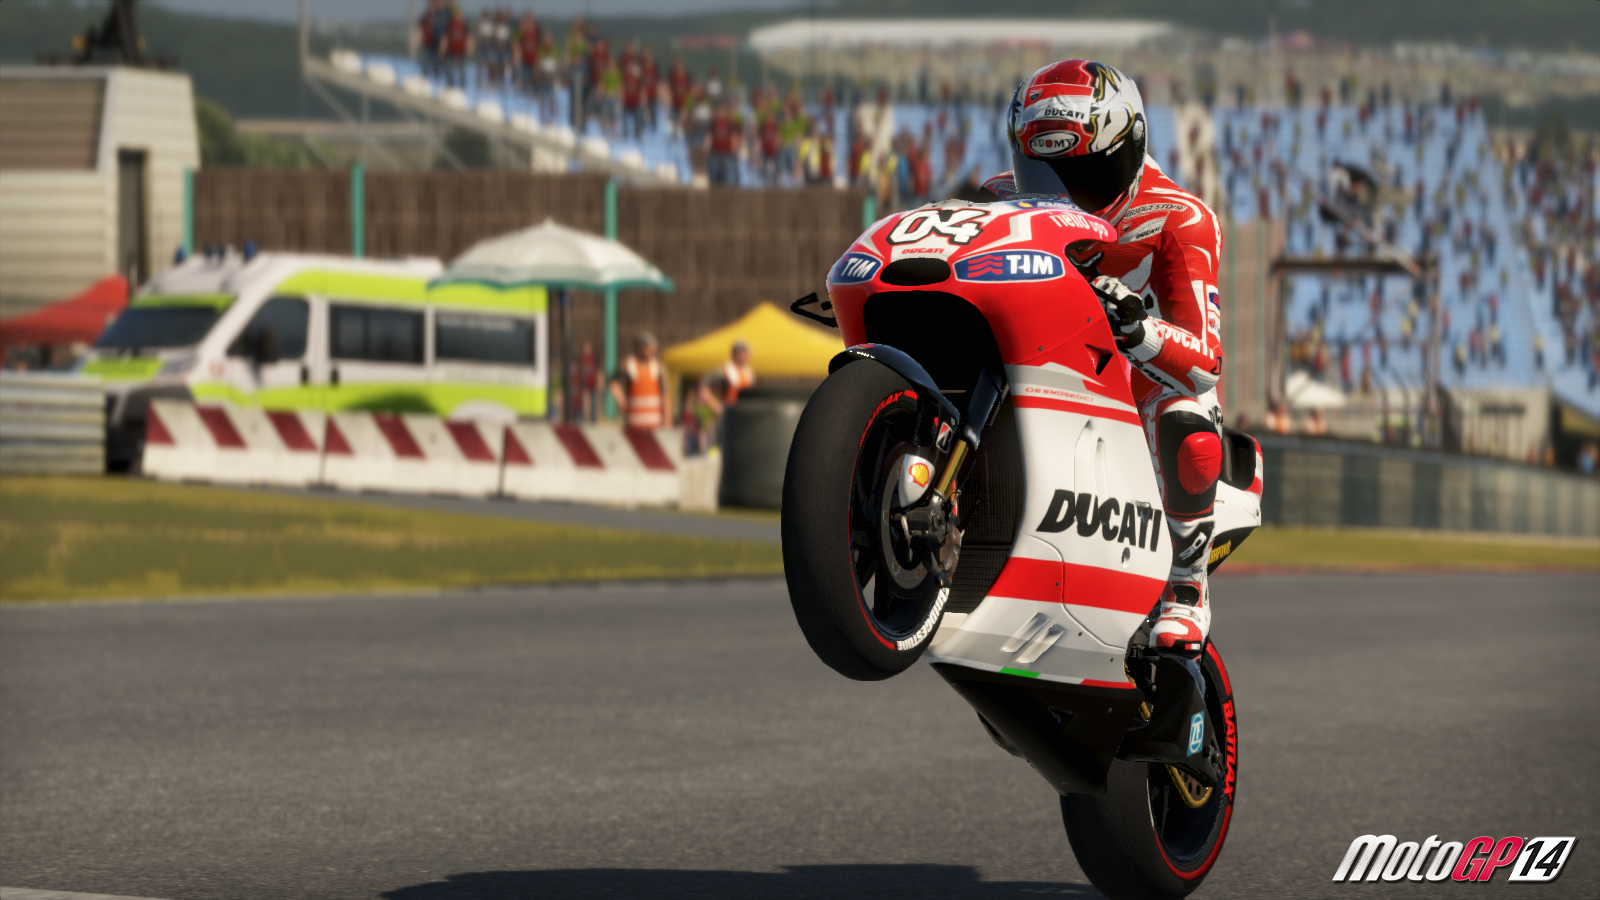 MotoGP 14 Multilenguaje ESPAÑOL XBOX 360 (Región NTSC-U/PAL) 3